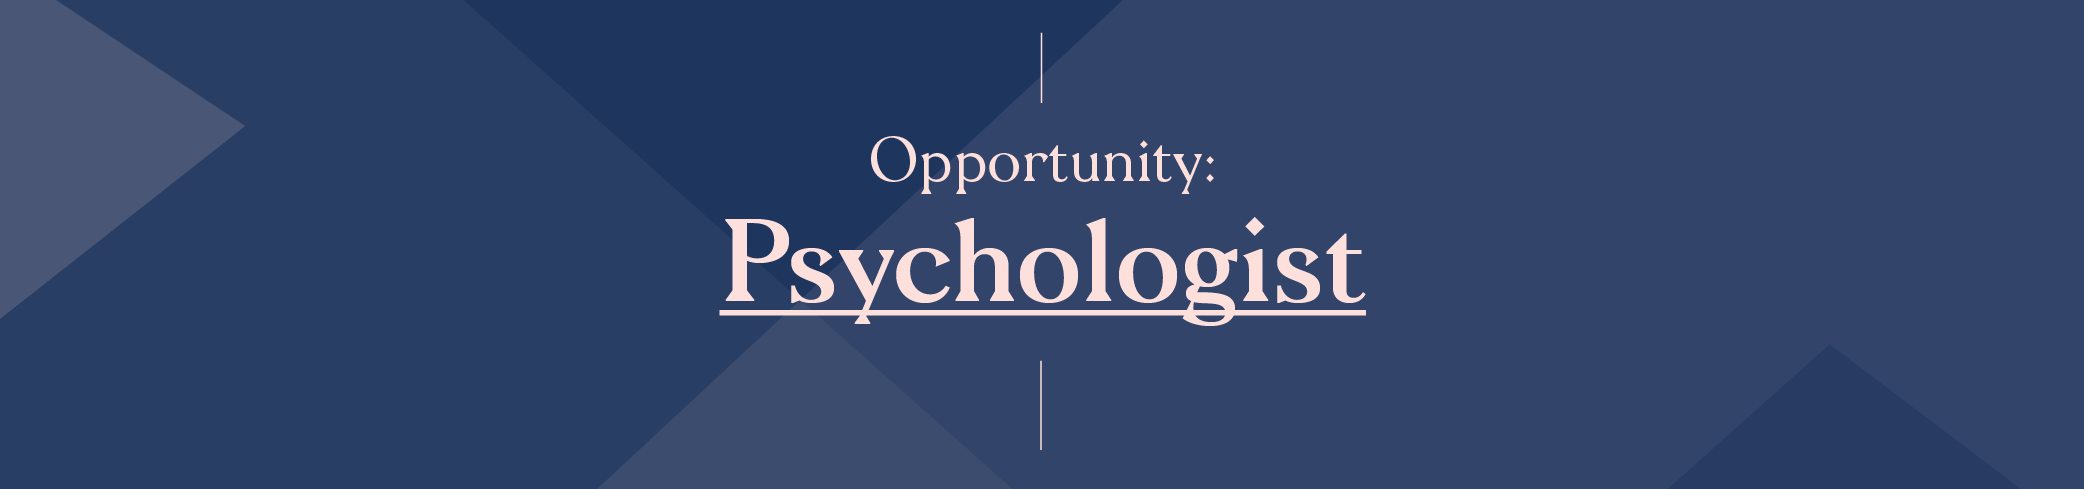 Job Banners_Psychologist